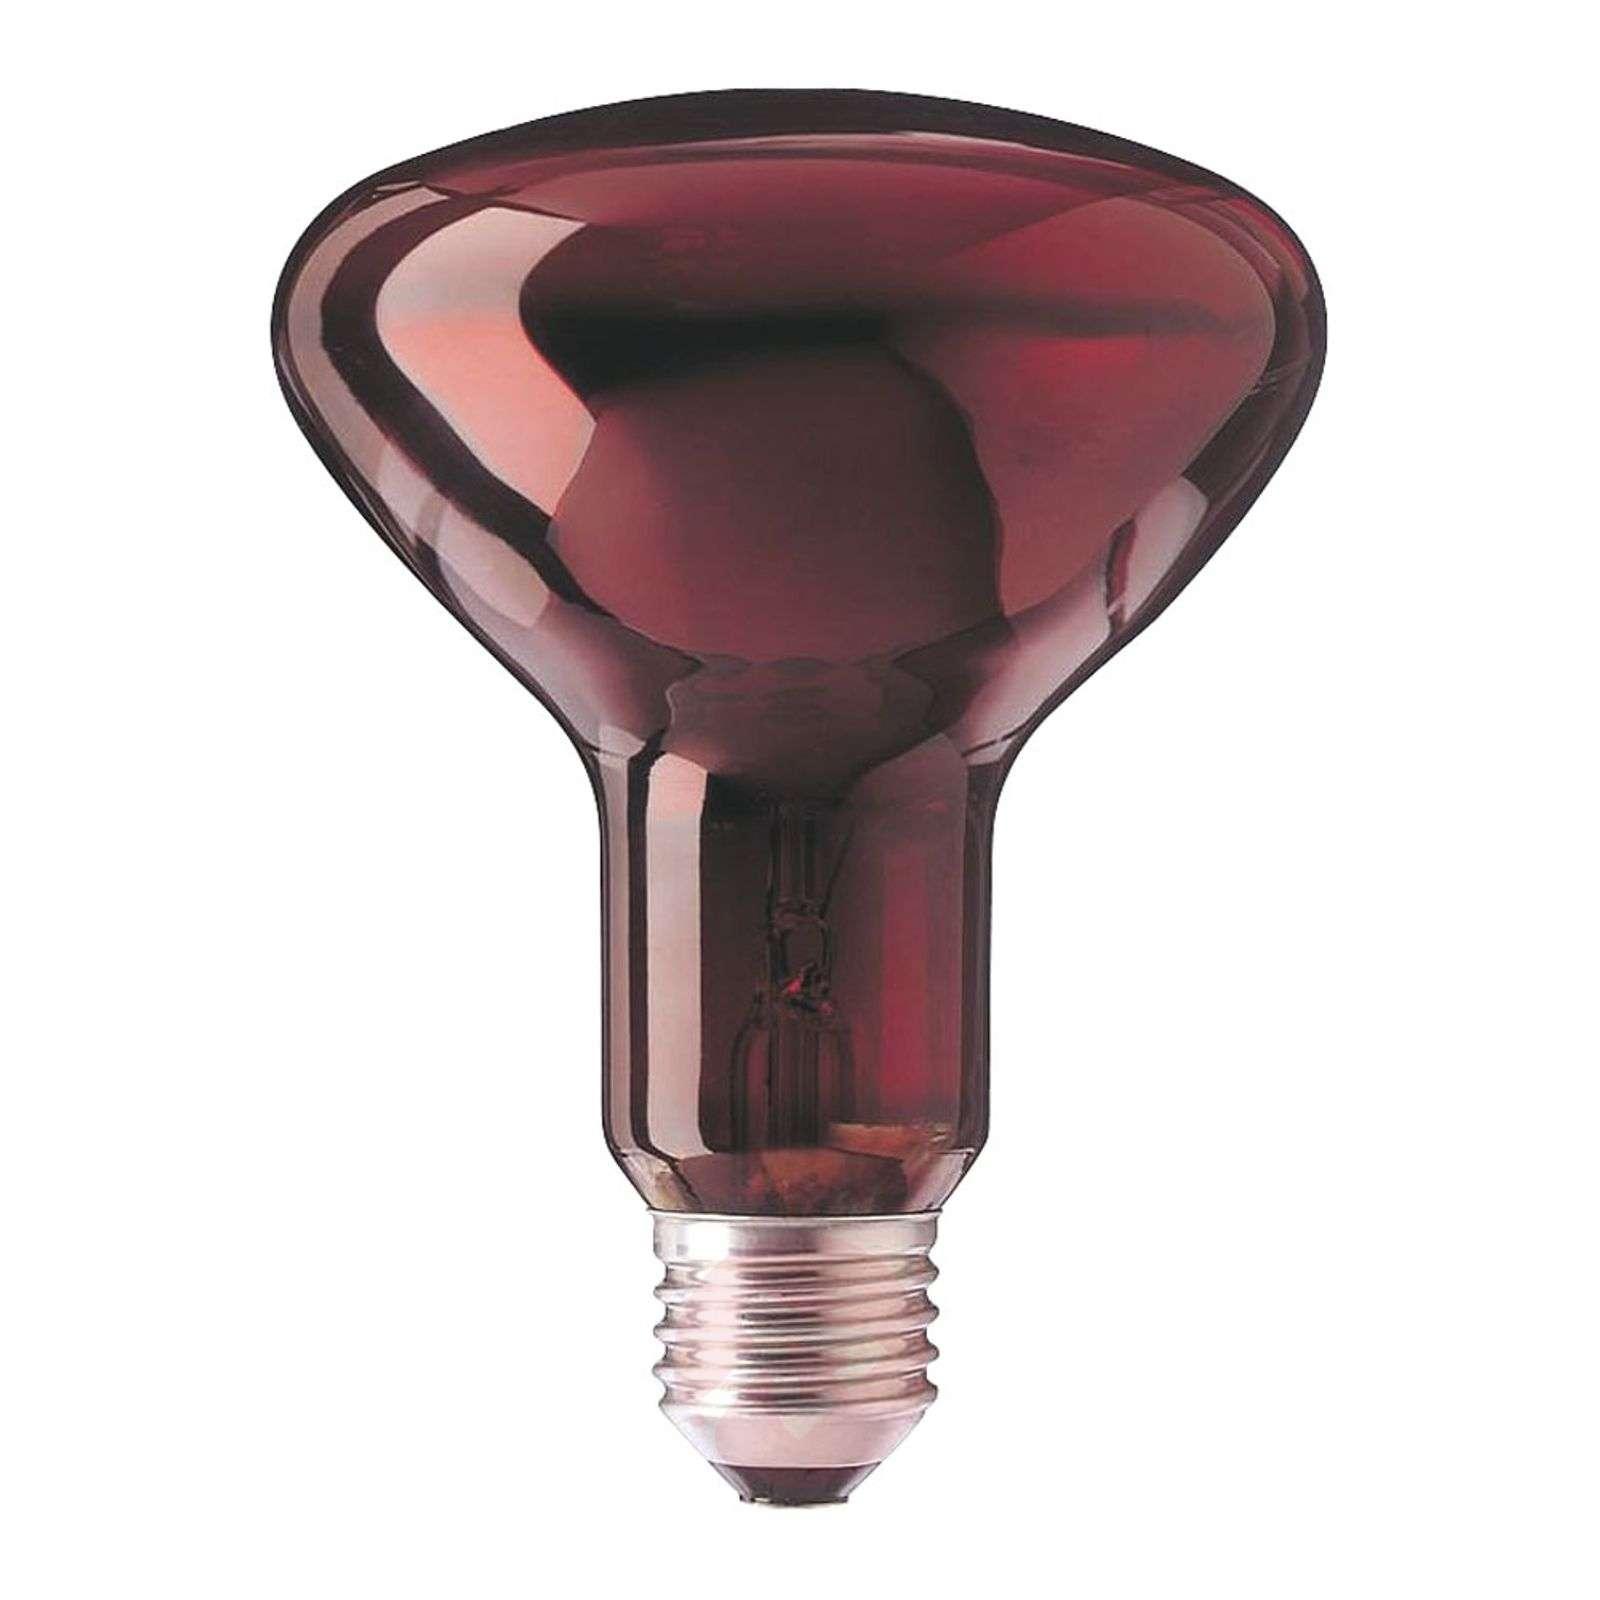 E27 100W IR reflector lamp R95-7504773-01